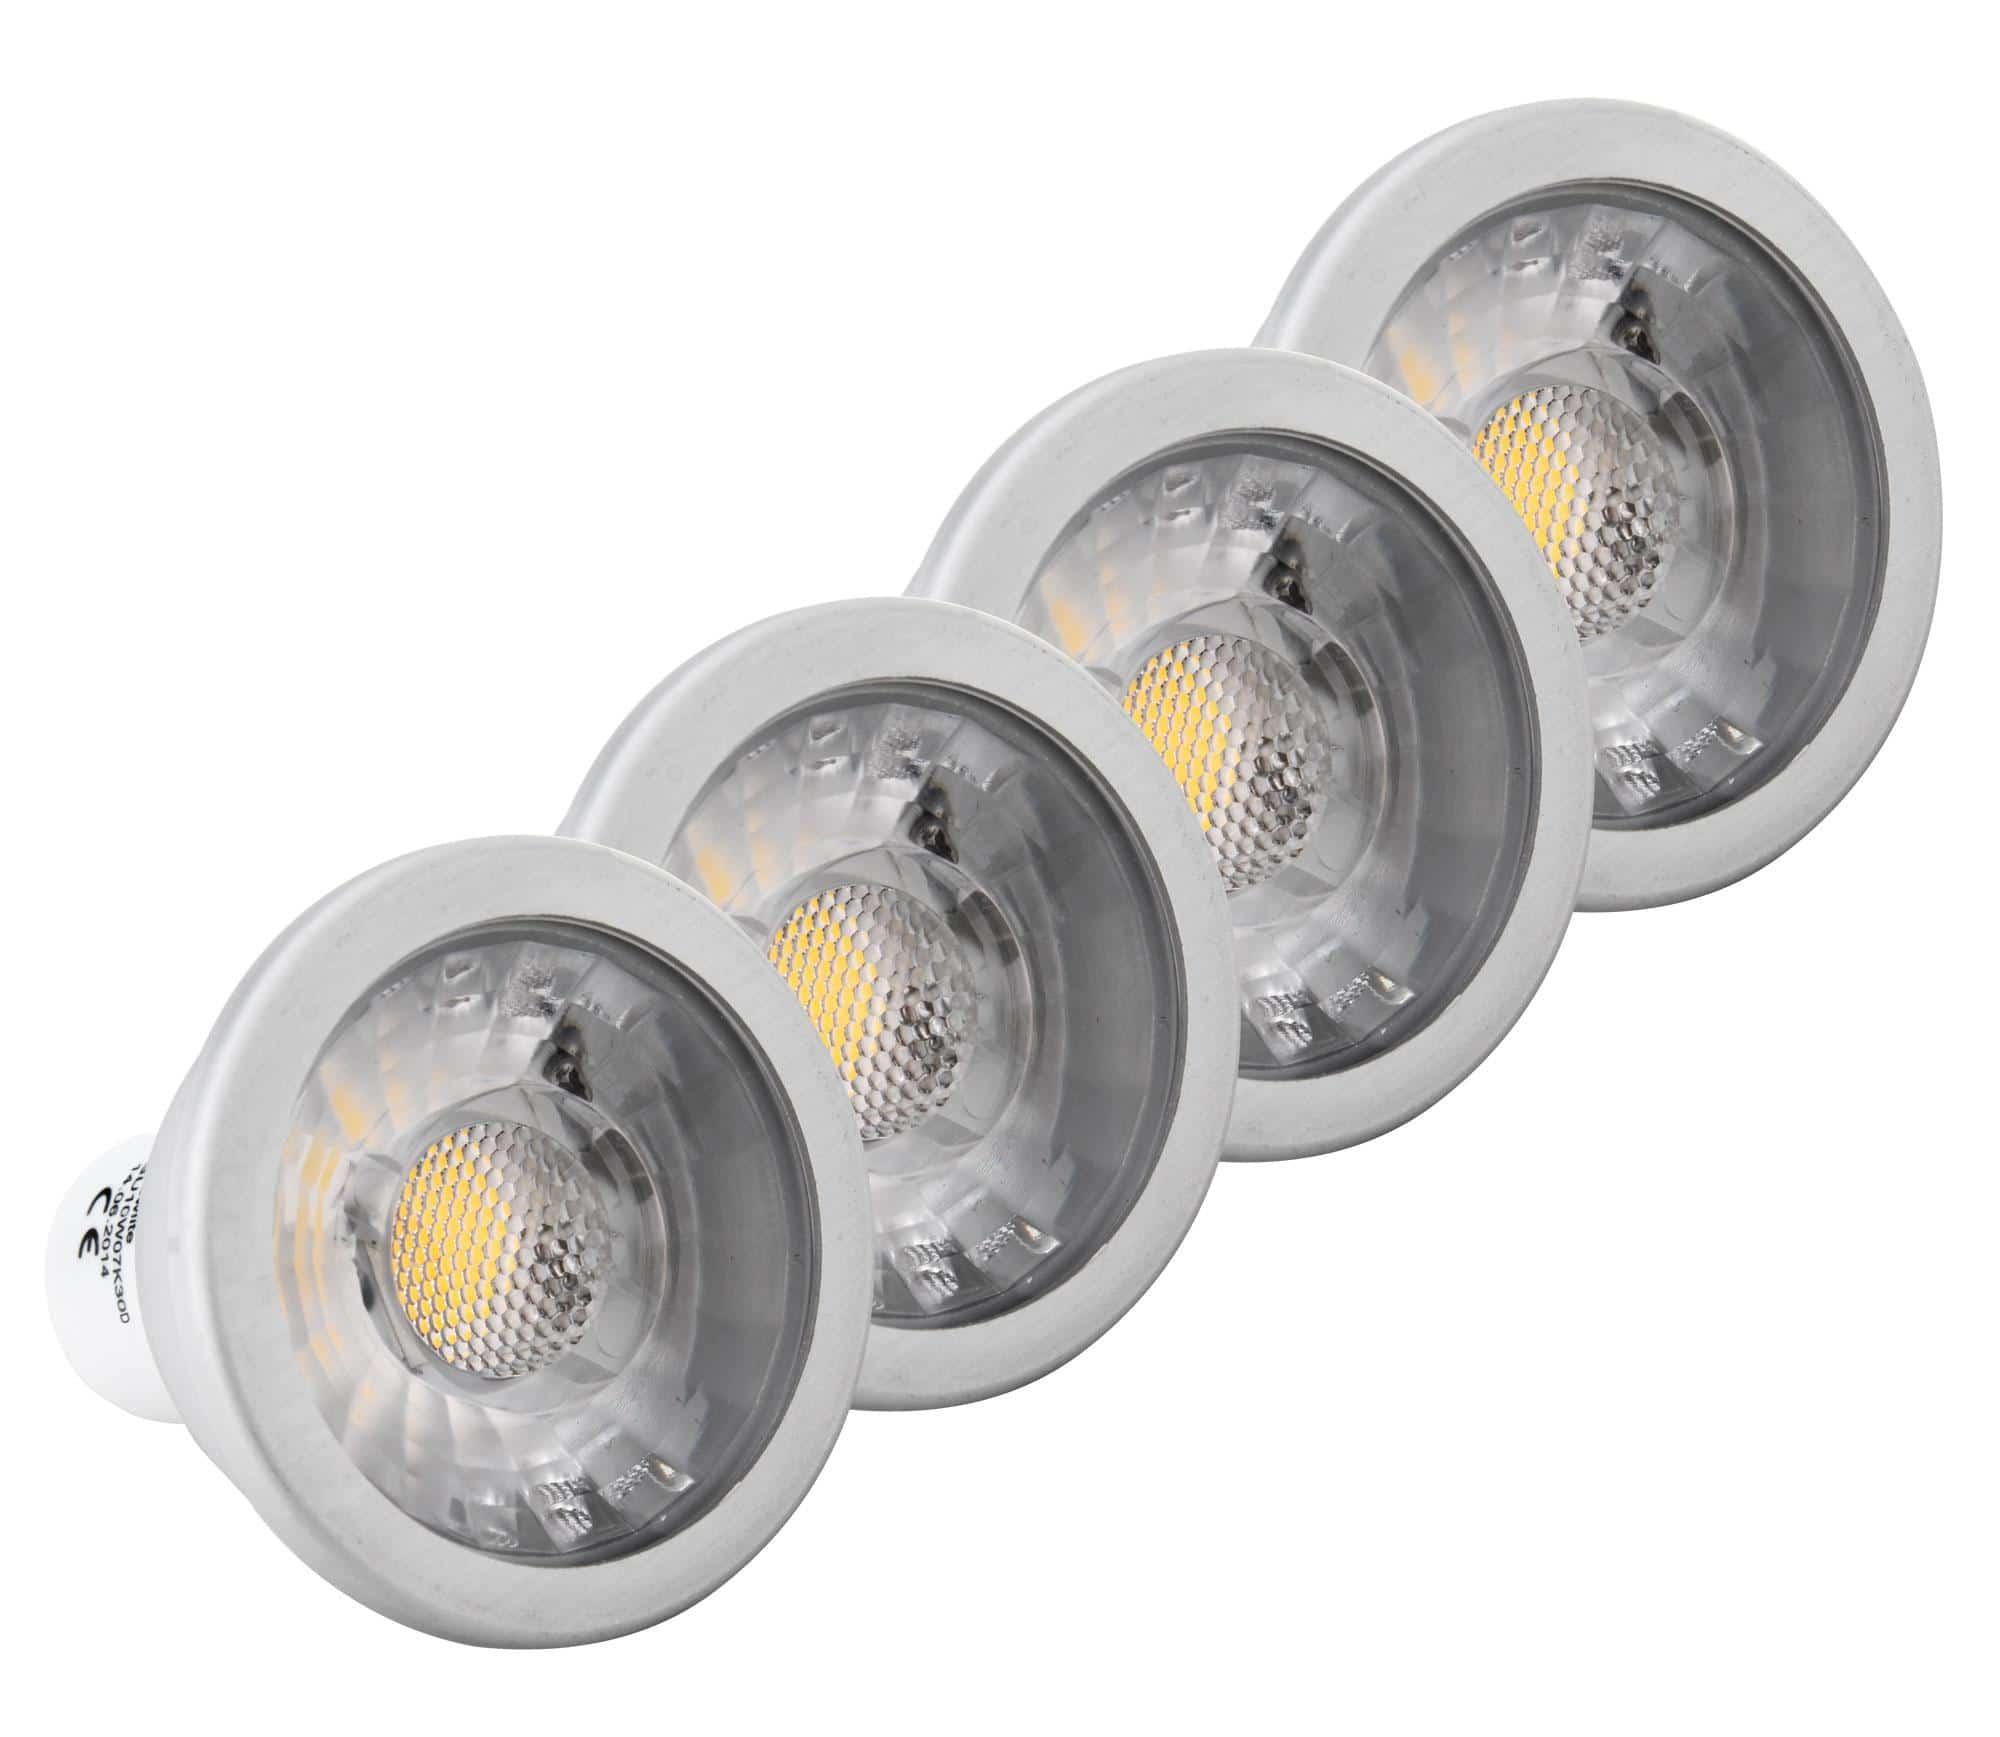 4x set showlite led spot cob gu10w07k30d 7 watt 550 lumen. Black Bedroom Furniture Sets. Home Design Ideas